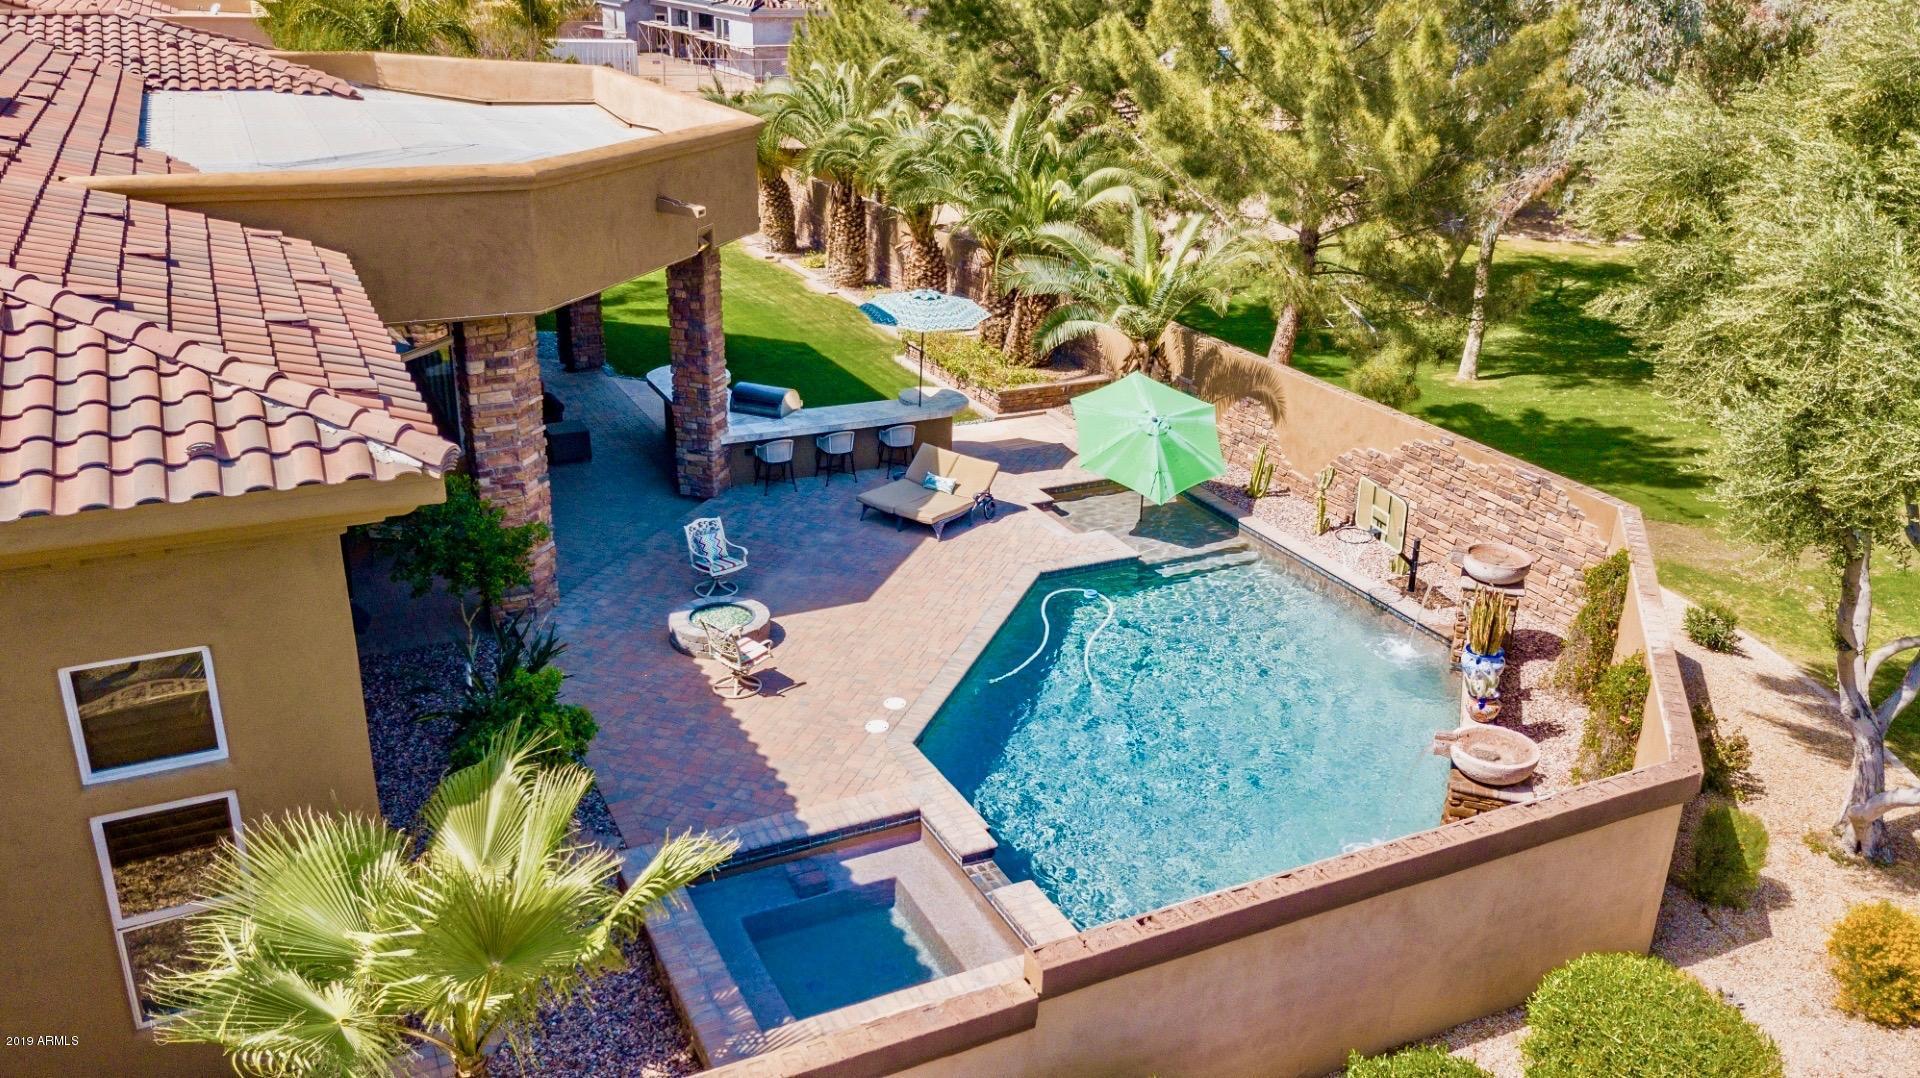 MLS 5902637 4450 E GEMINI Place, Chandler, AZ 85249 Corner Lots